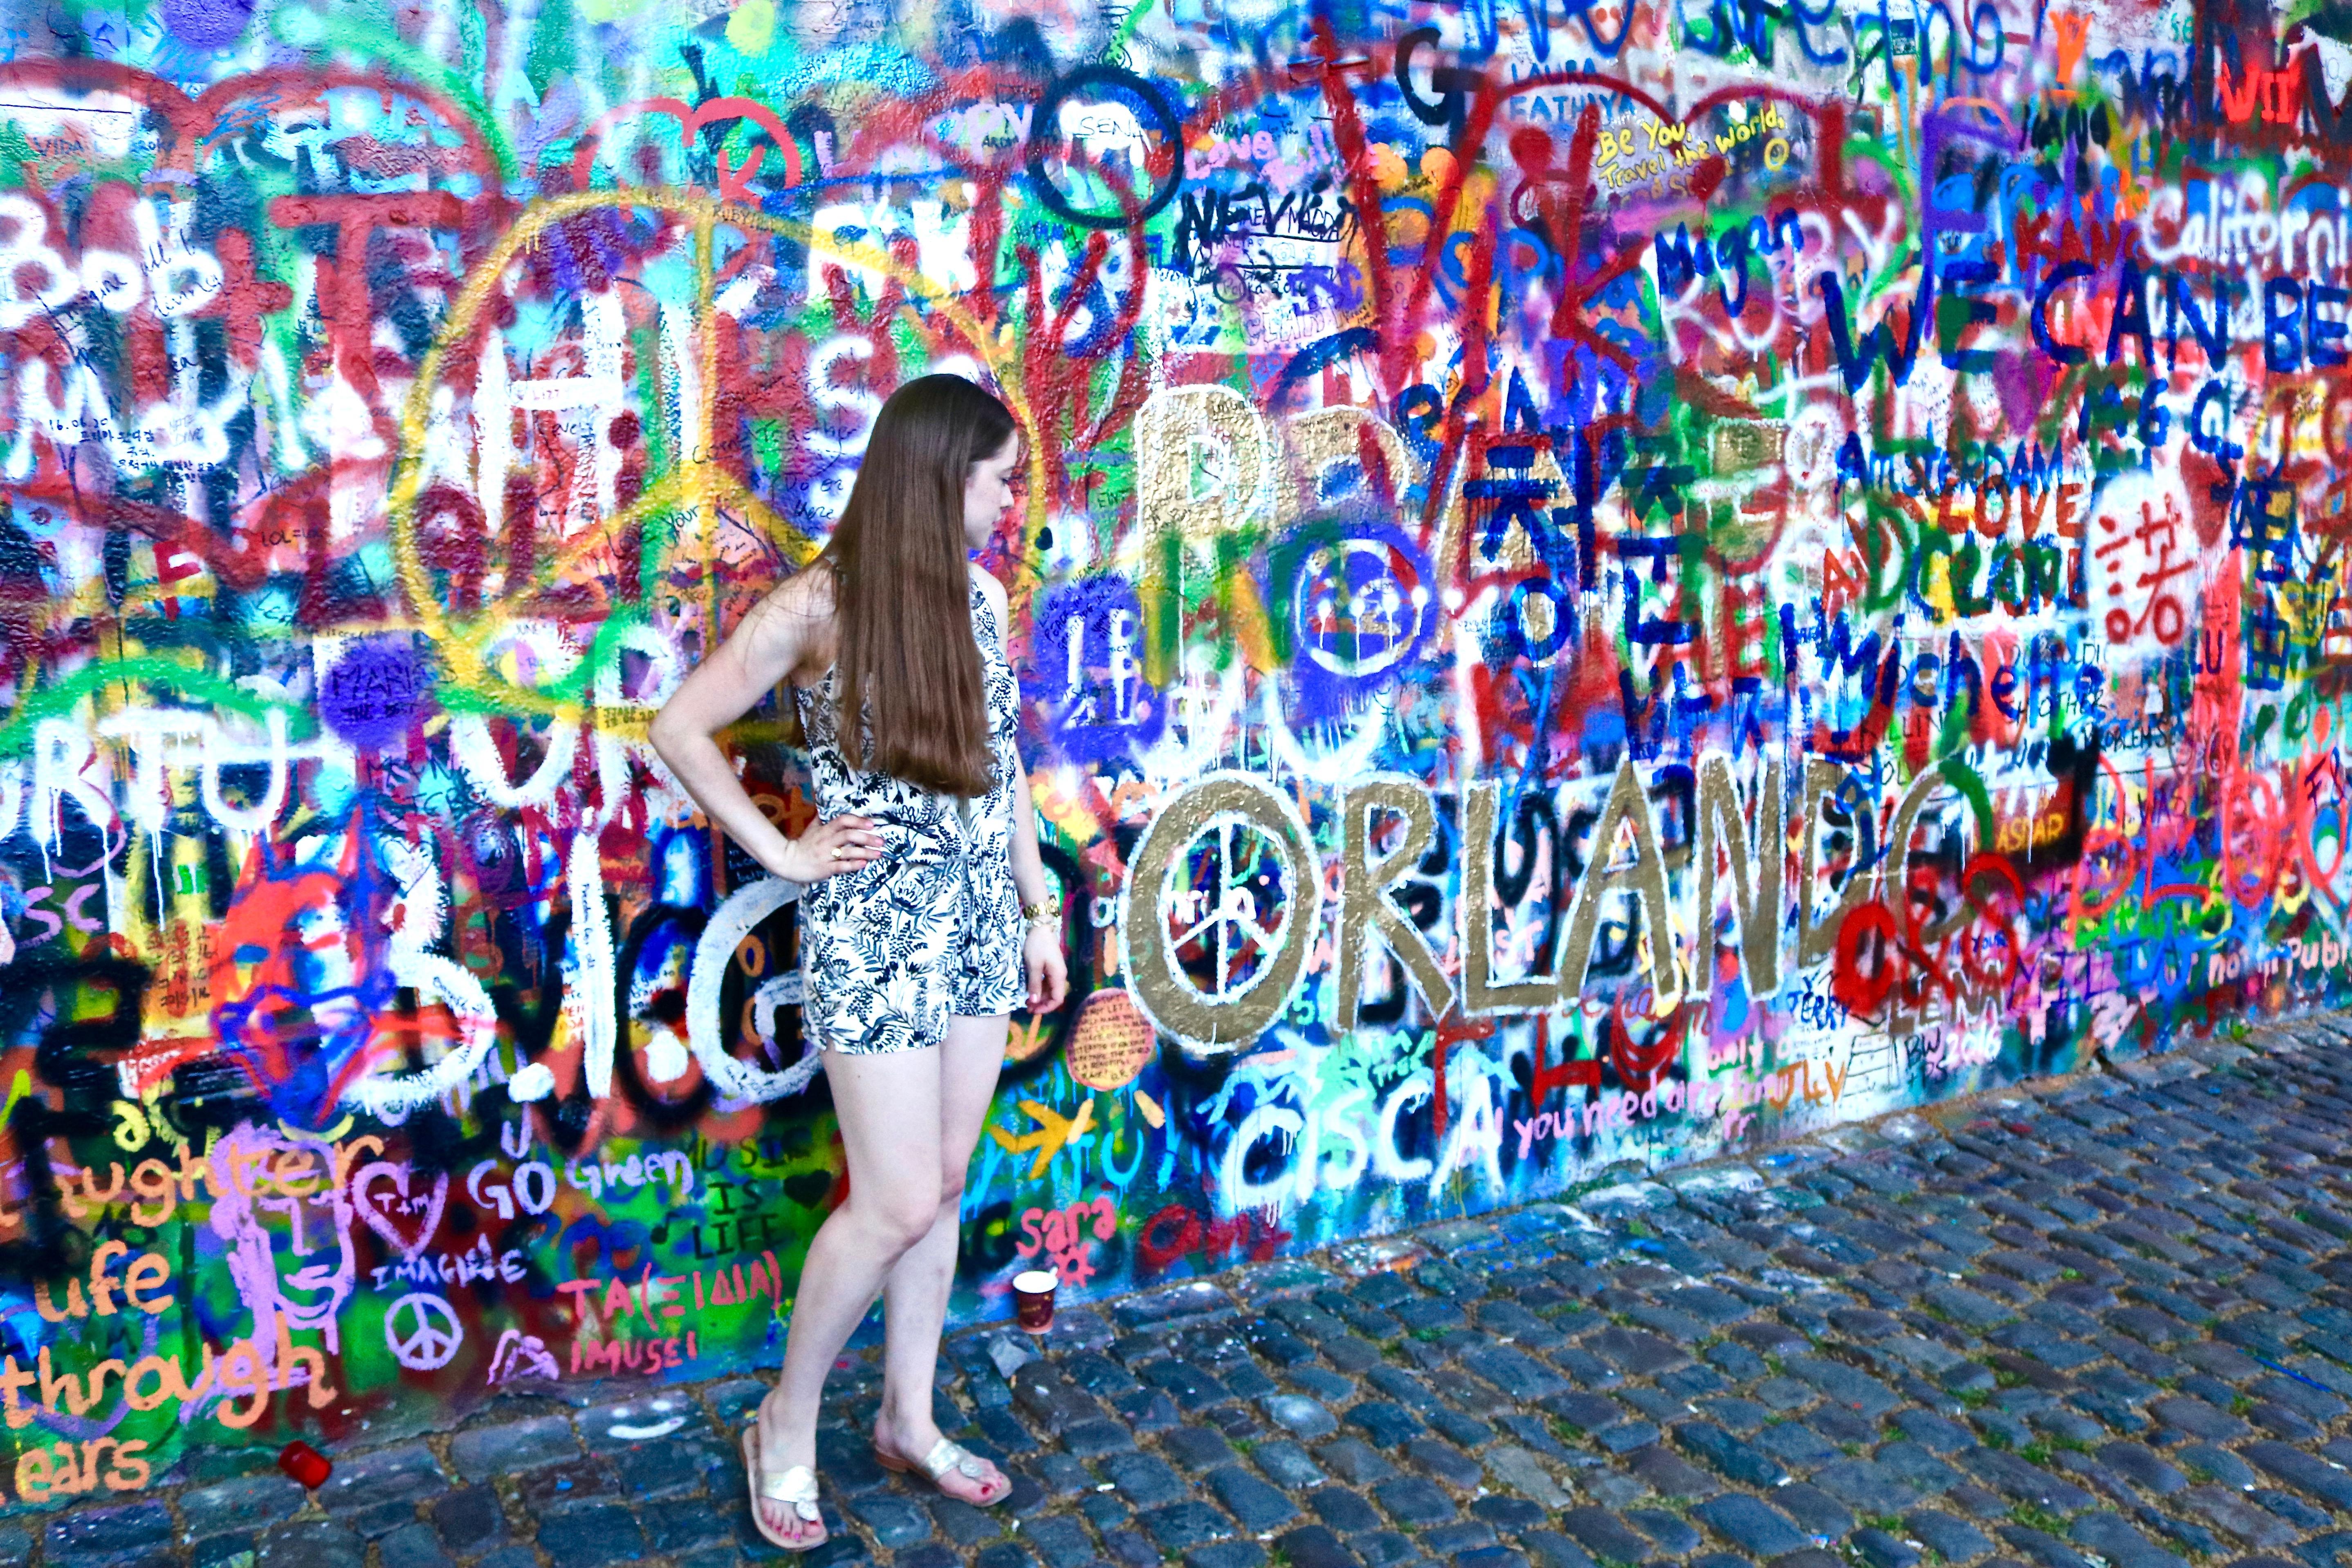 Lennon Wall Prague bowtifullife.com 7